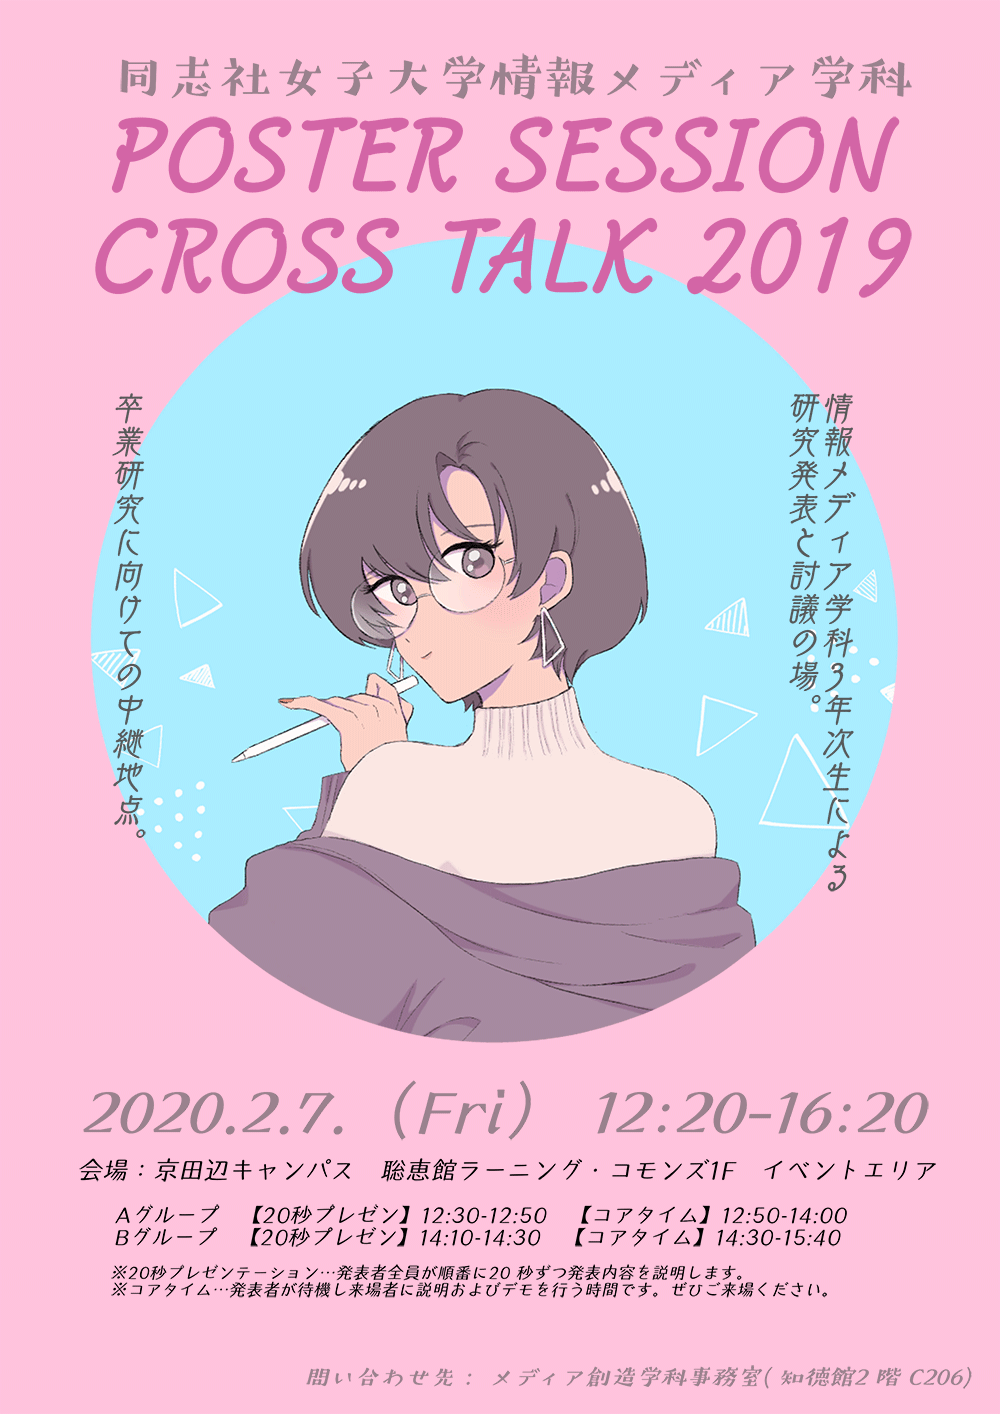 Cross Talk 2019 情報メディア学科3年次生 研究ポスターセッション